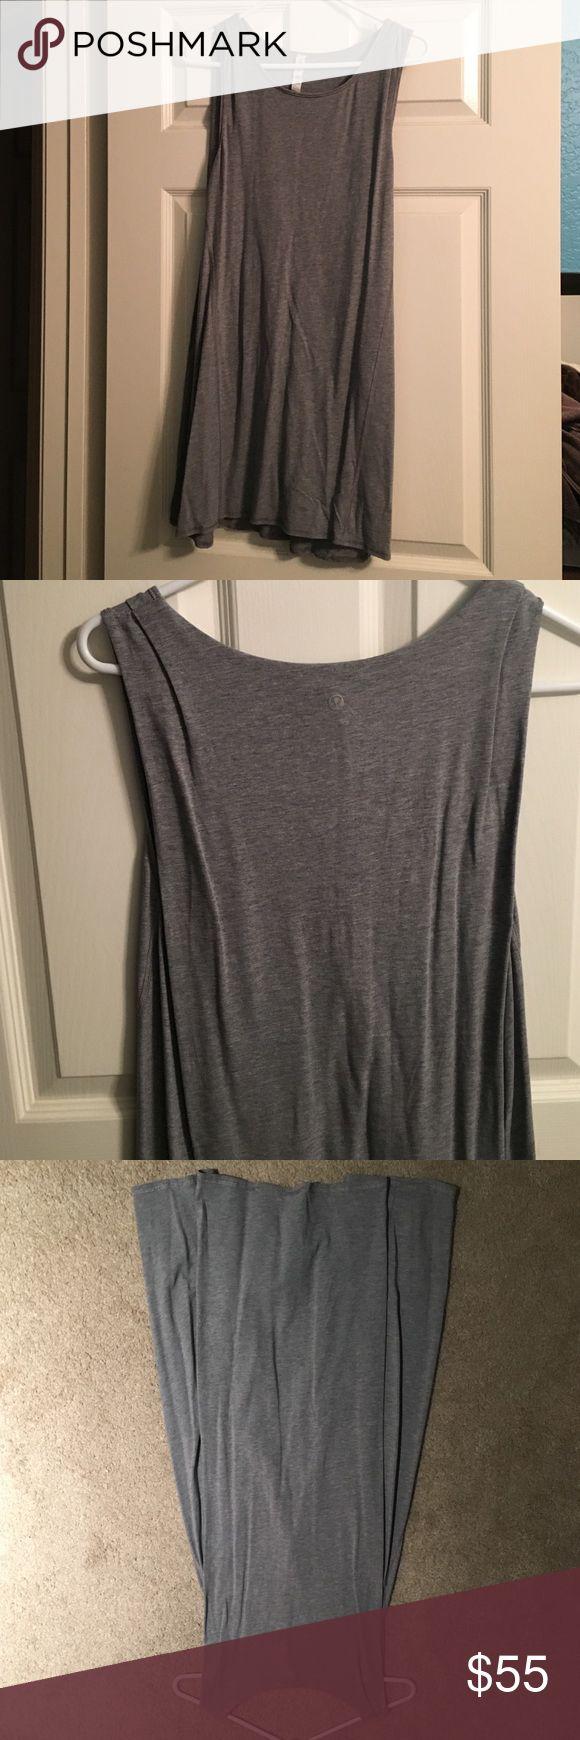 Grey lululemon dress Super cute! Prefect condition. No flaws! lululemon athletica Dresses